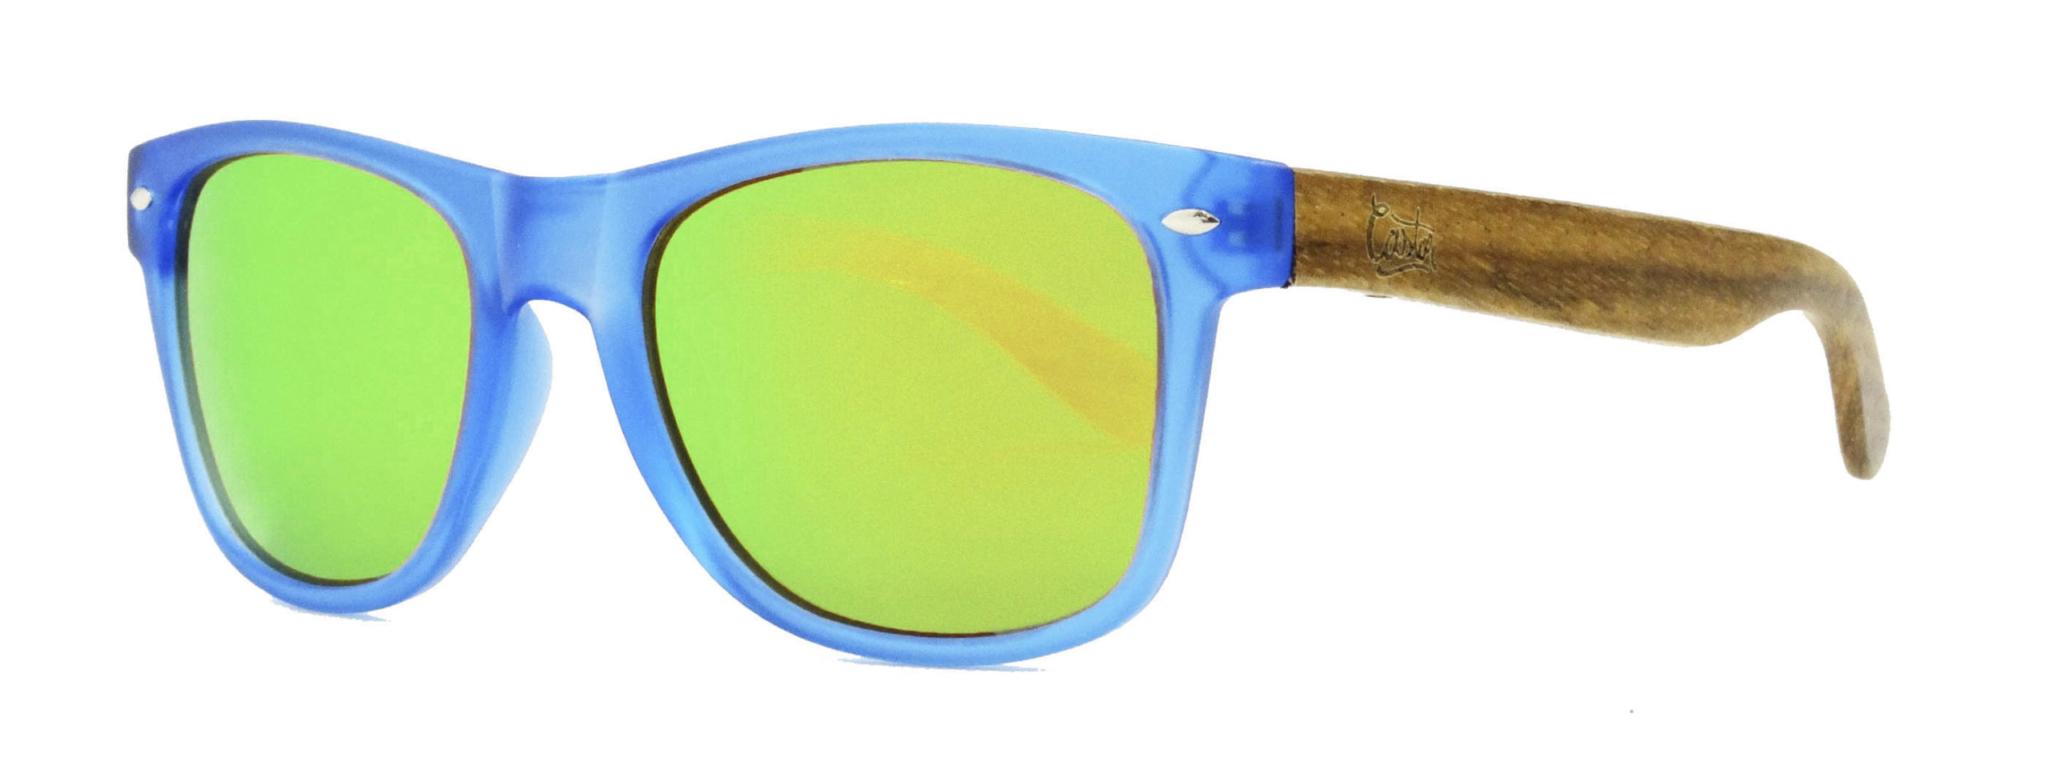 b9eb59da-109b-gafas-de-sol